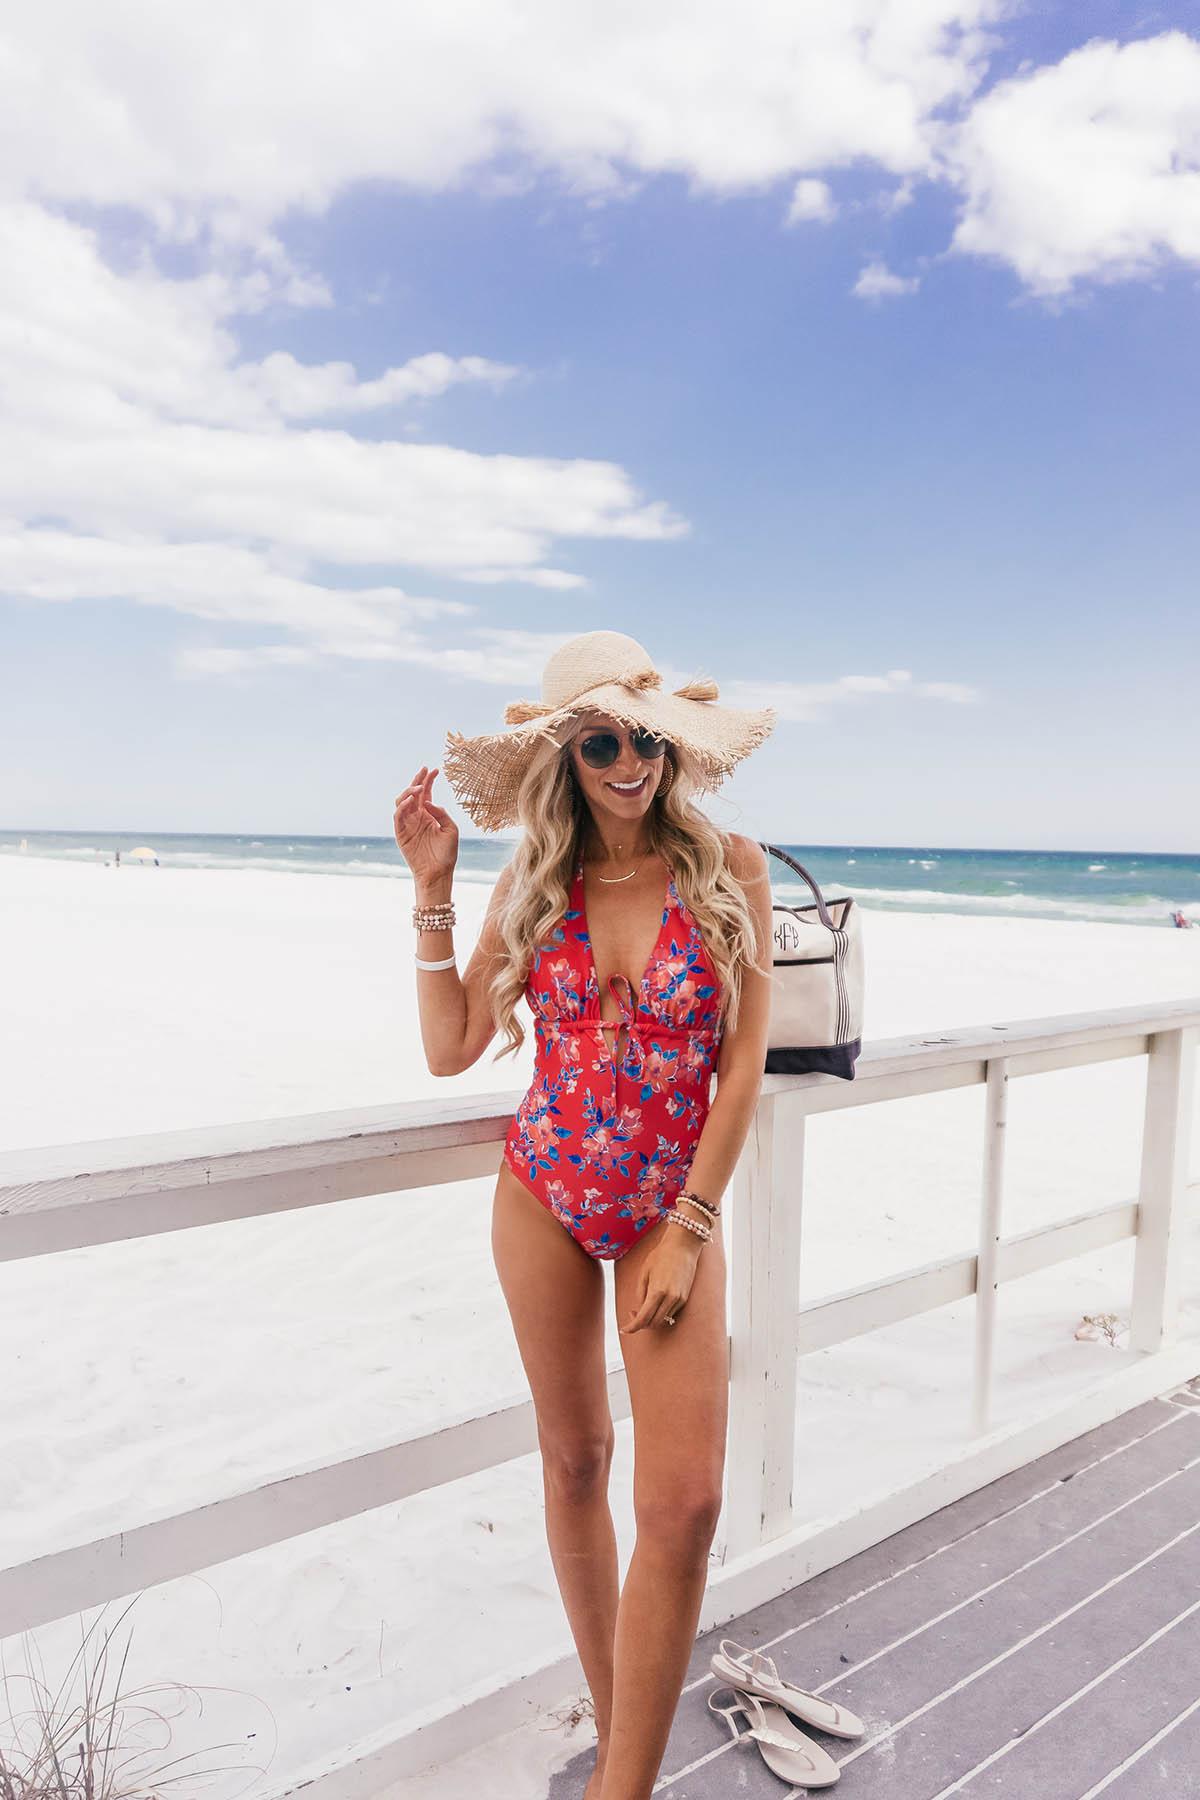 Land's End Swimwear | Chic Swimwear Styles for Summer